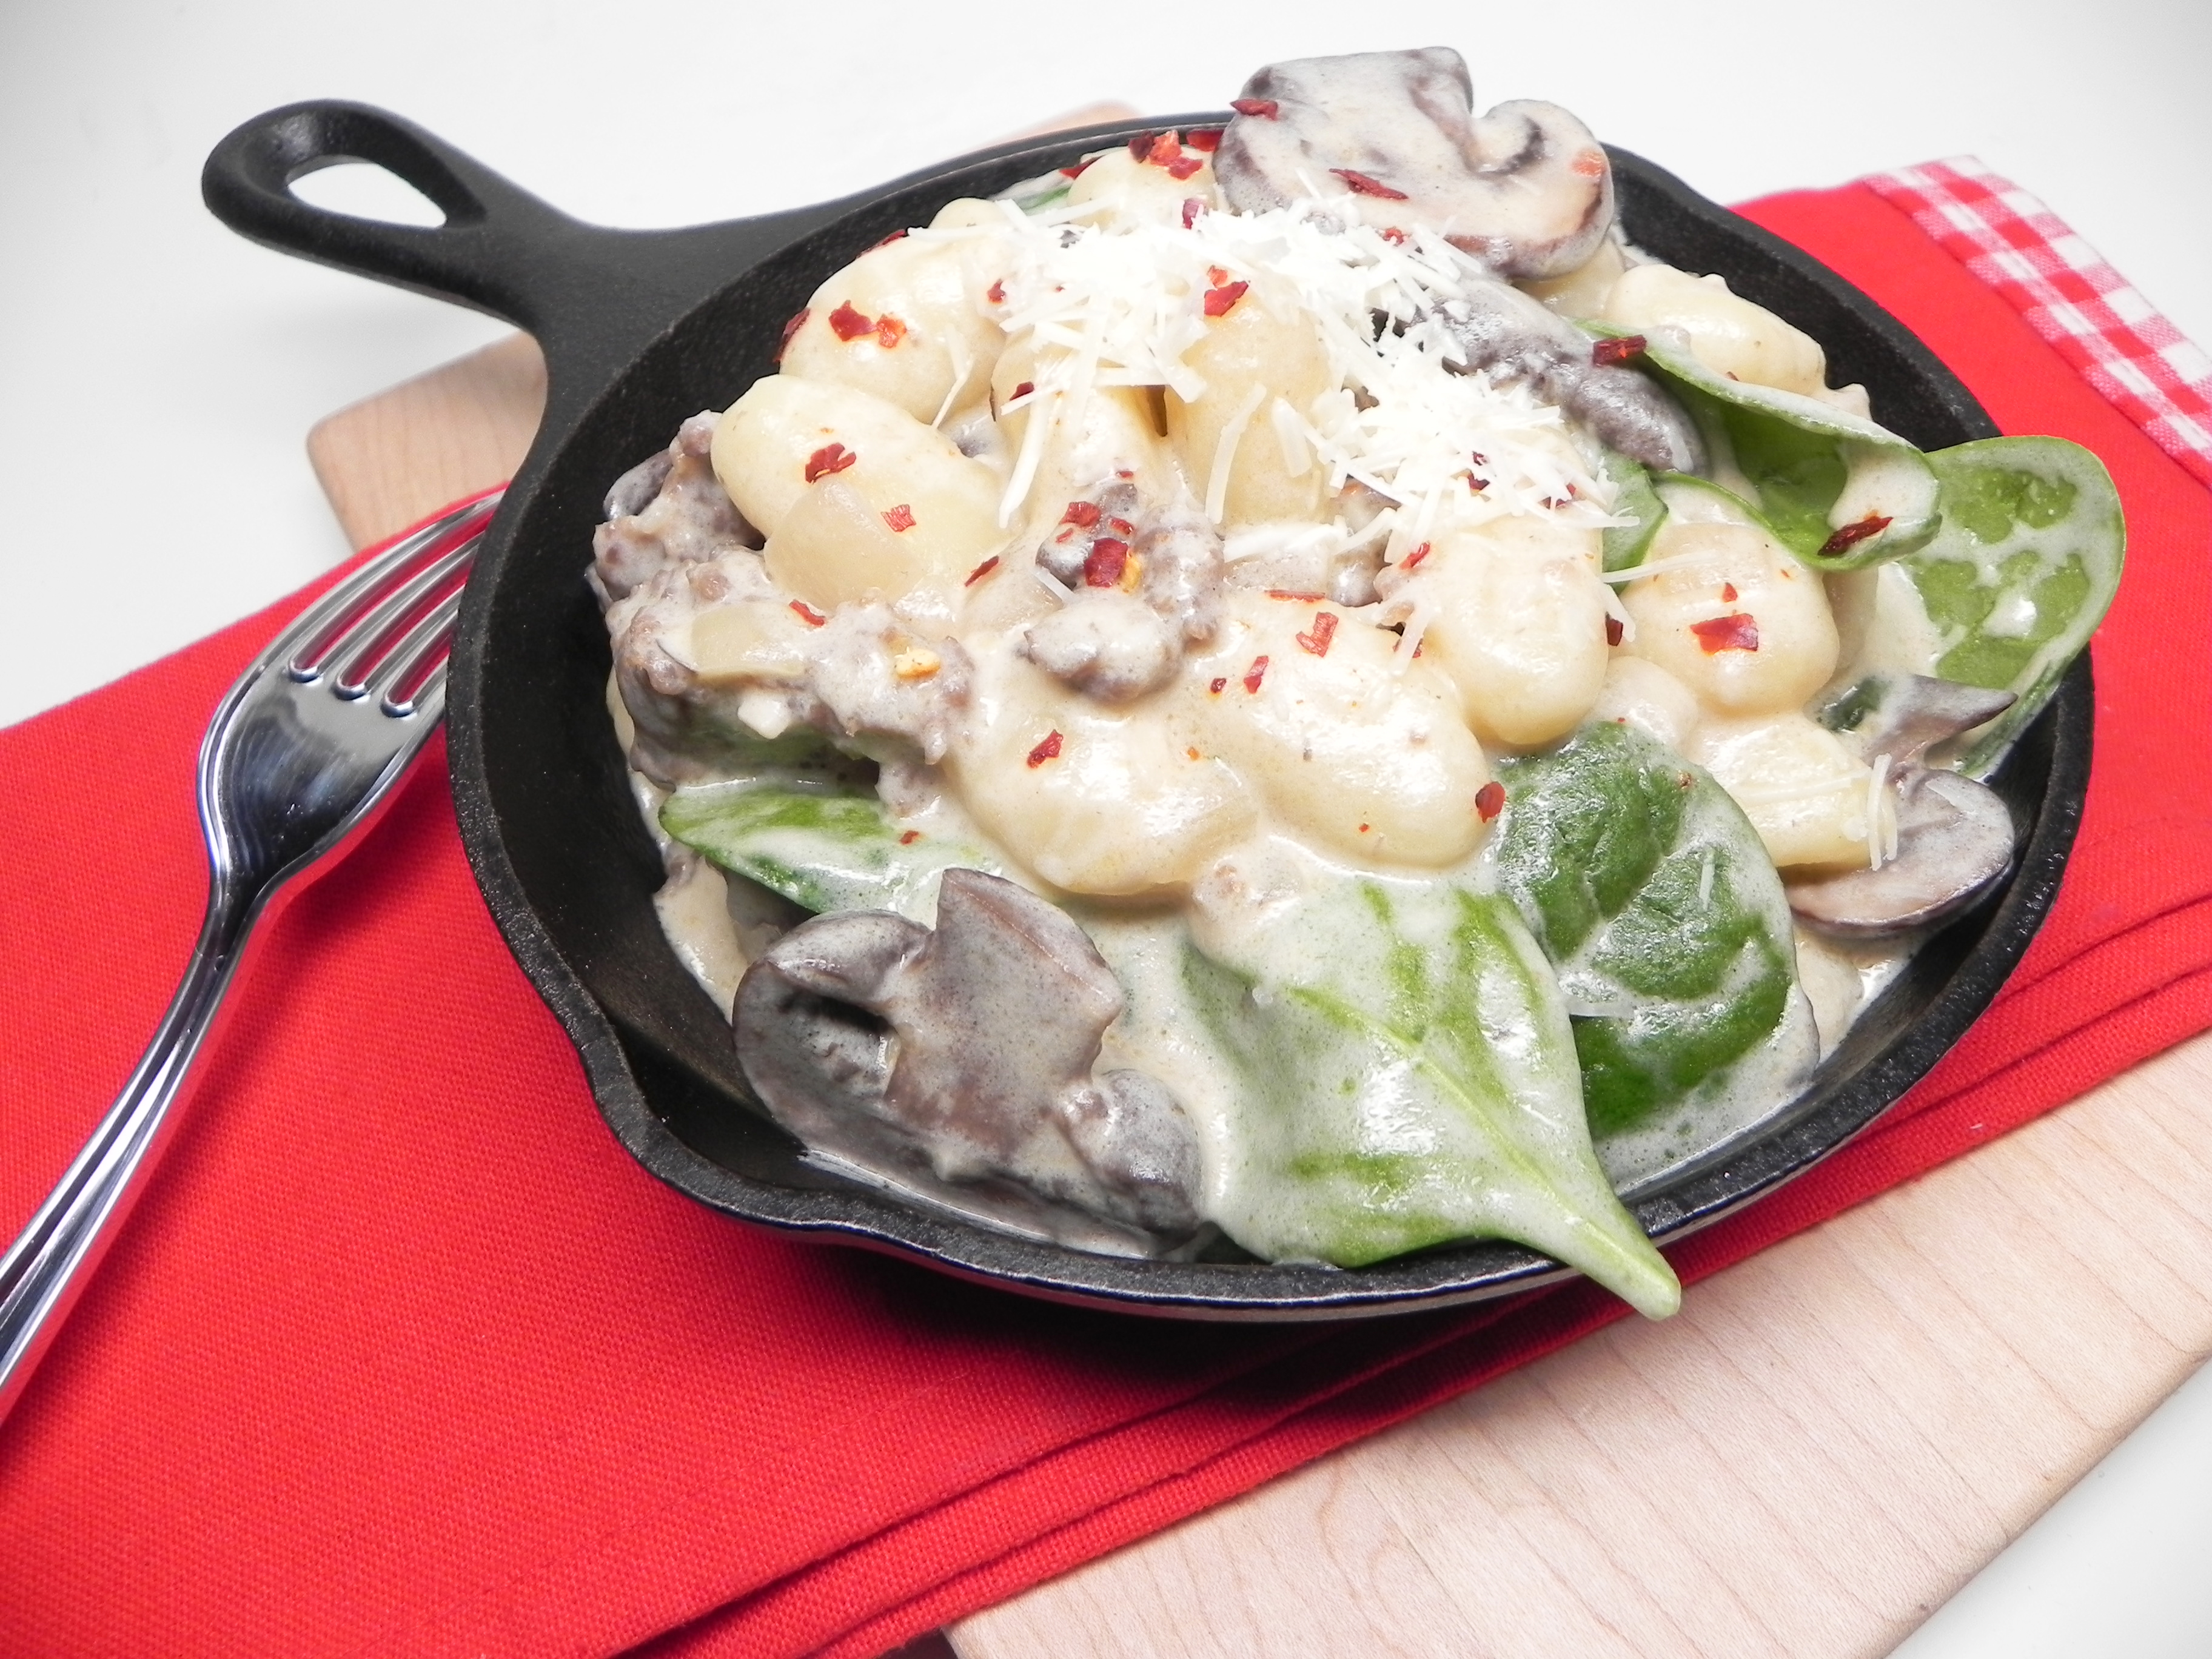 Creamy Gnocchi and Sausage Skillet